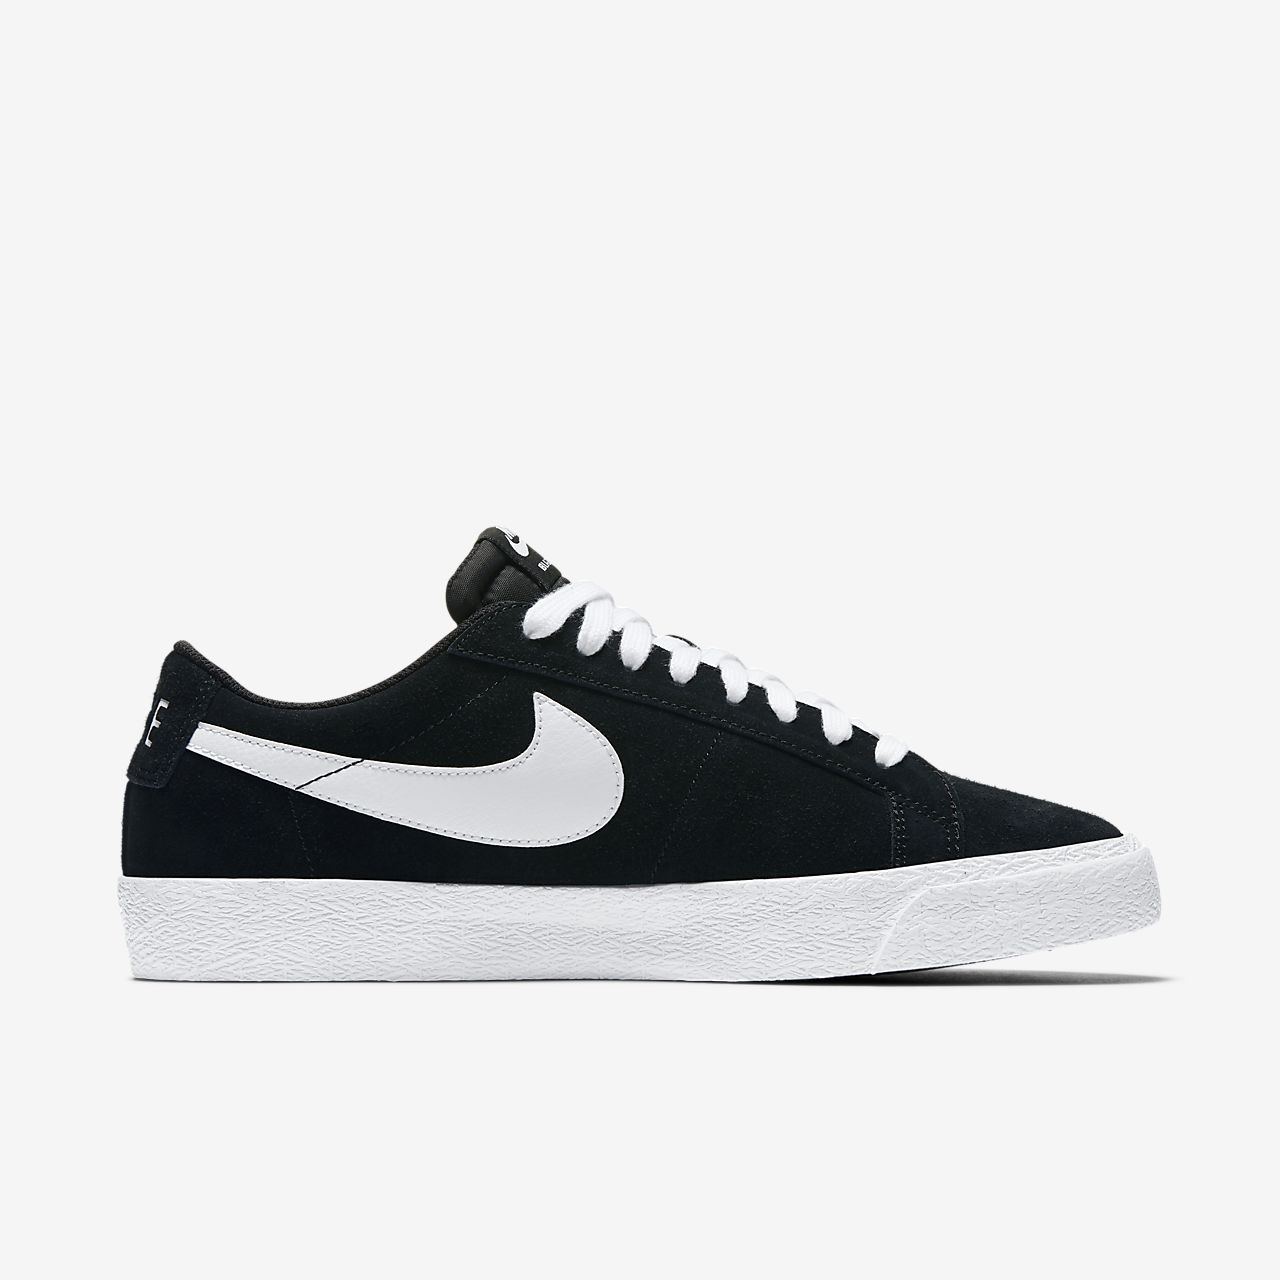 e4014517303 Chaussure de skateboard Nike SB Blazer Zoom Low pour Homme. Nike.com FR